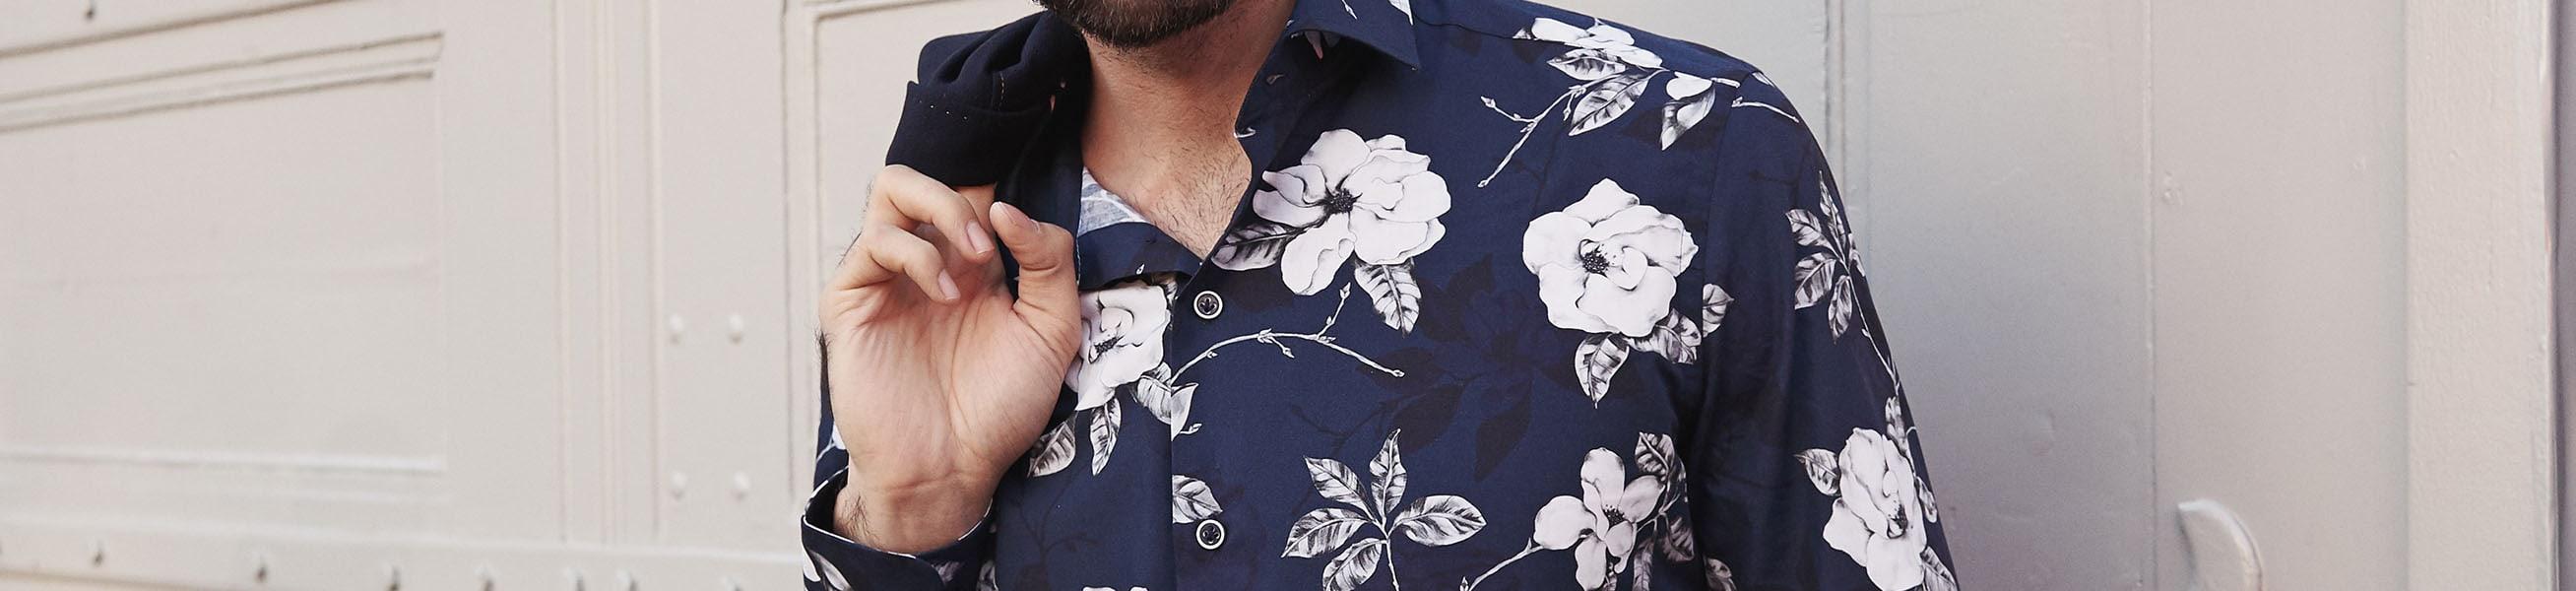 Blumen Hemden